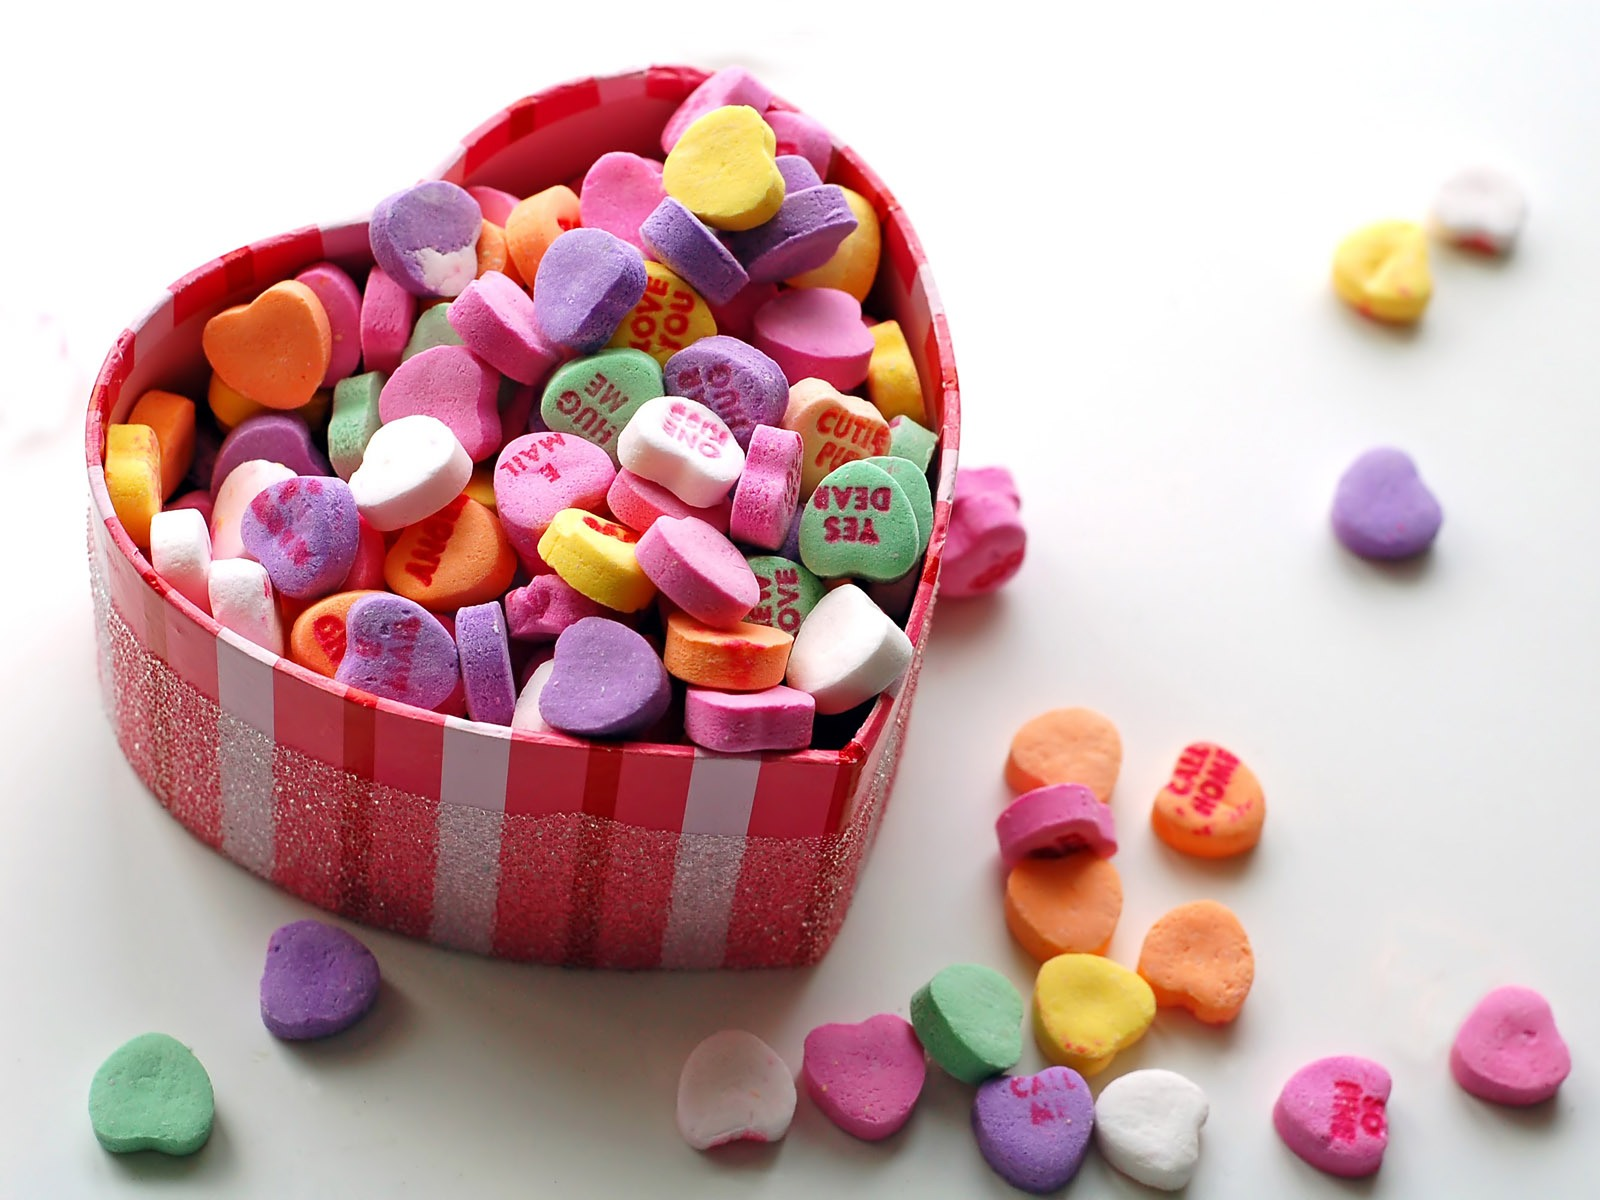 More-than-40-million -heart-shaped-chocolate-box